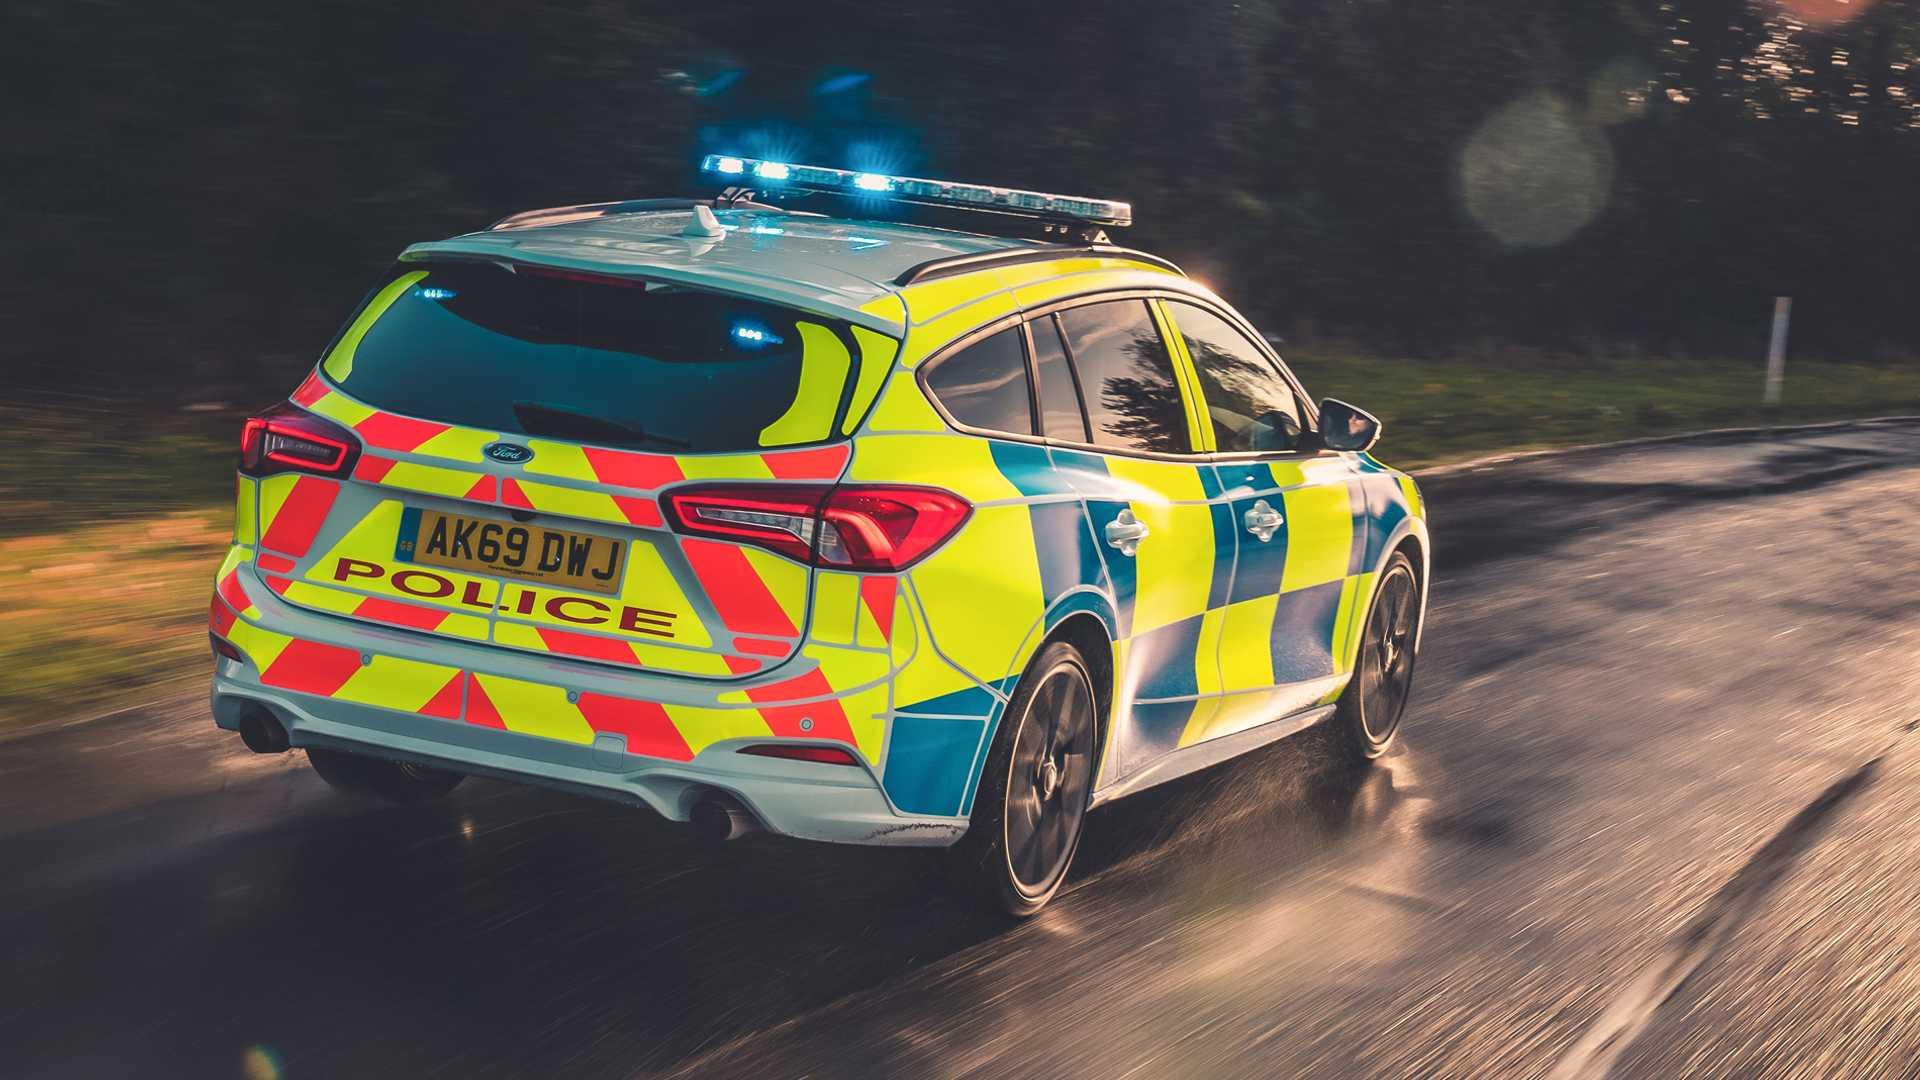 Ford-Focus-ST-and-Ranger-Raptor-UK-police-cars-7